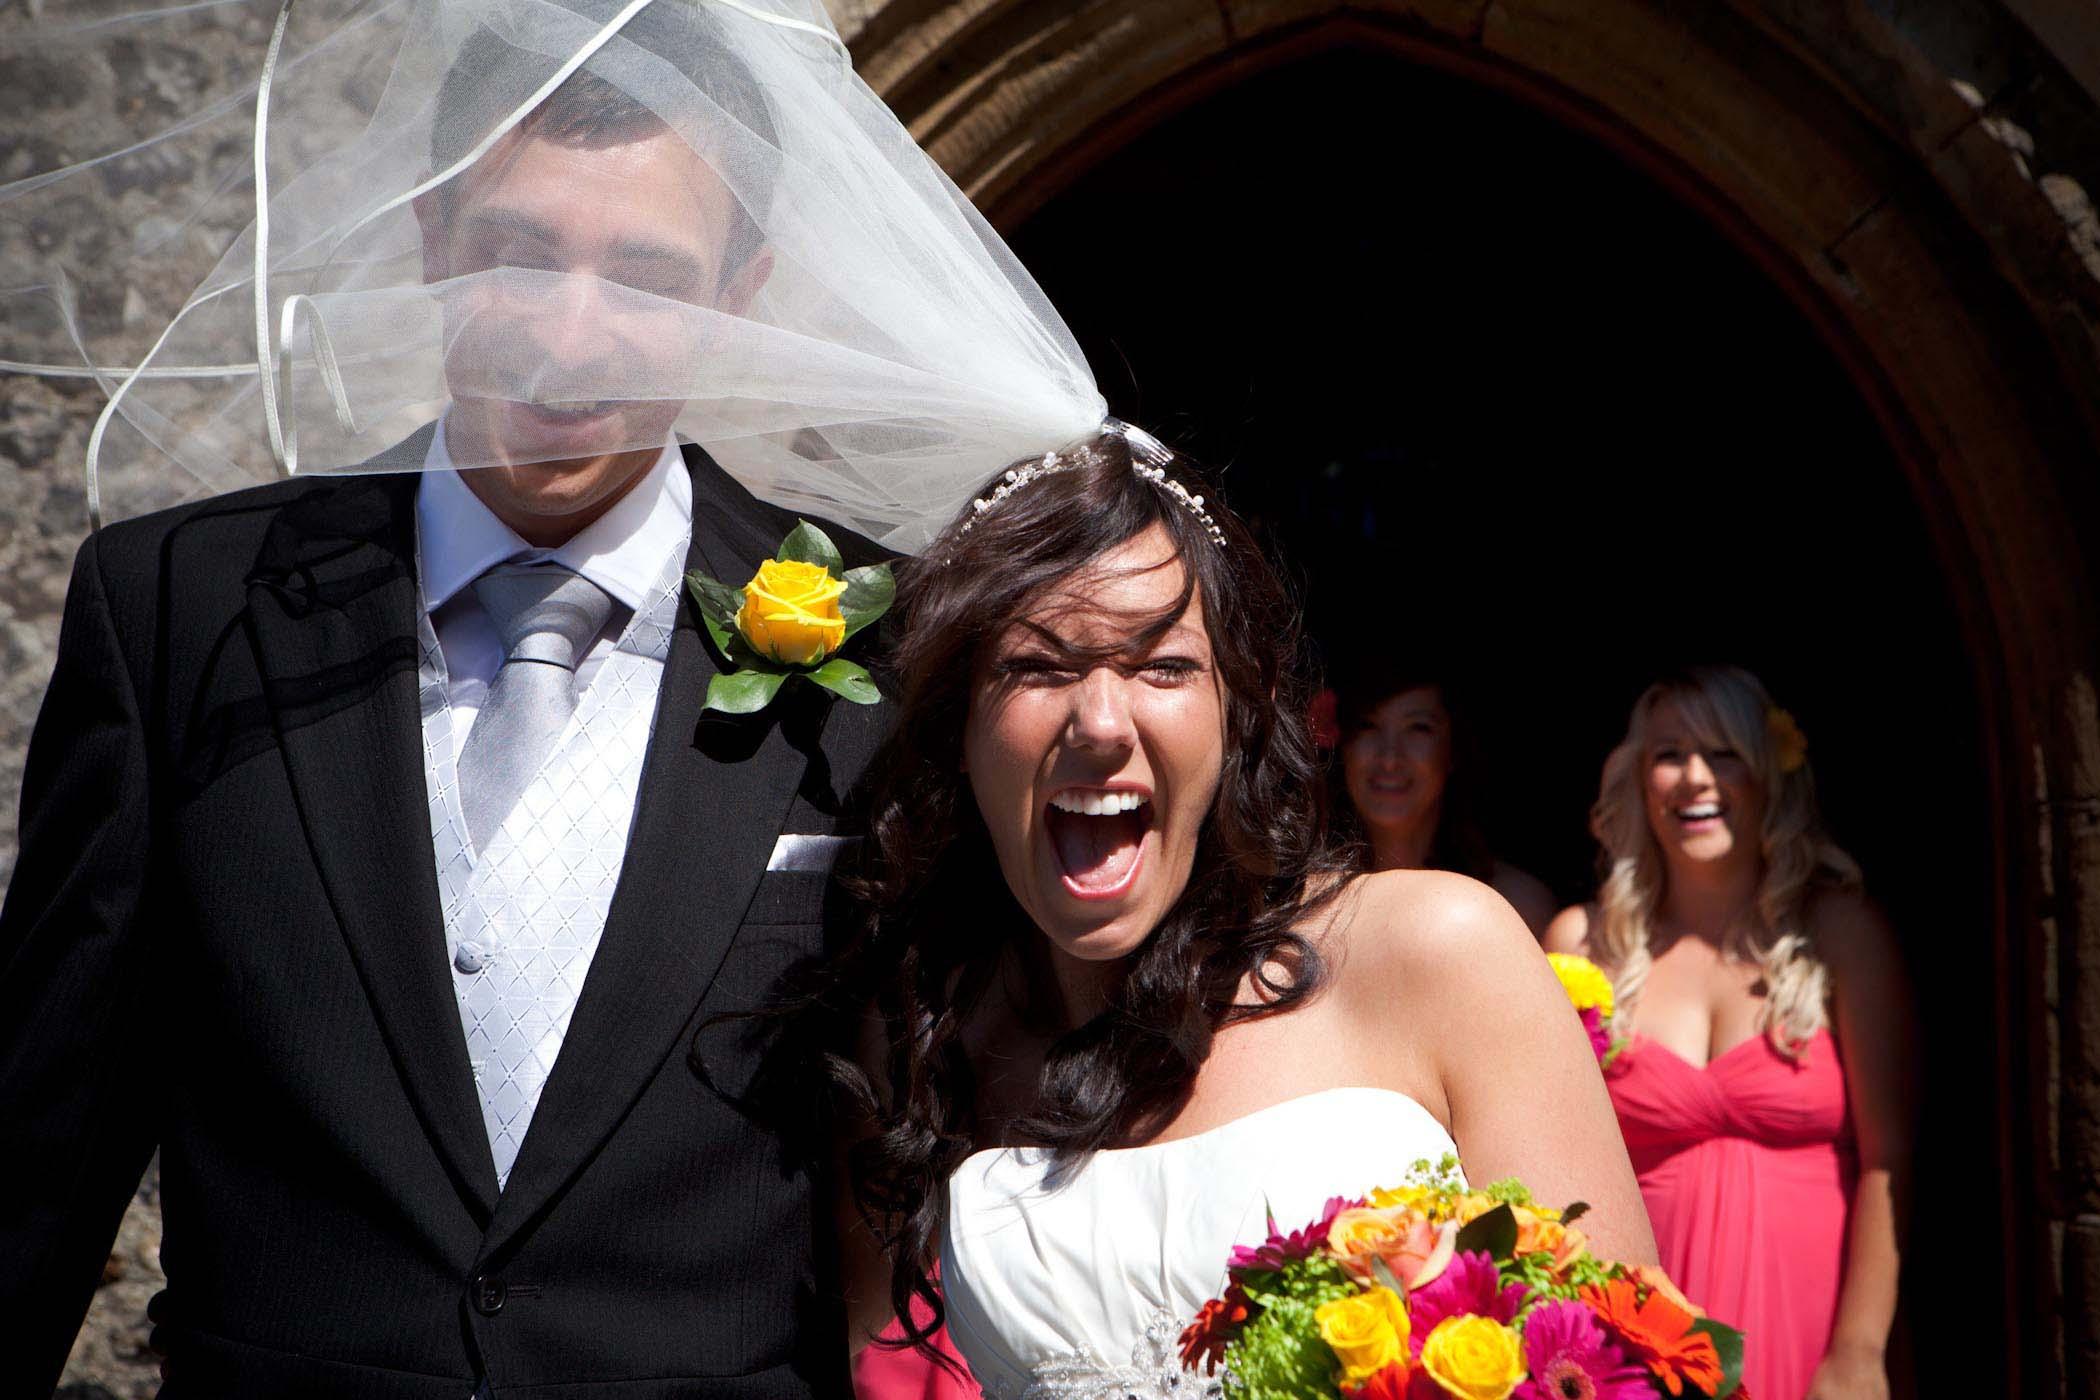 dan_burman_wedding_photography (14).jpg